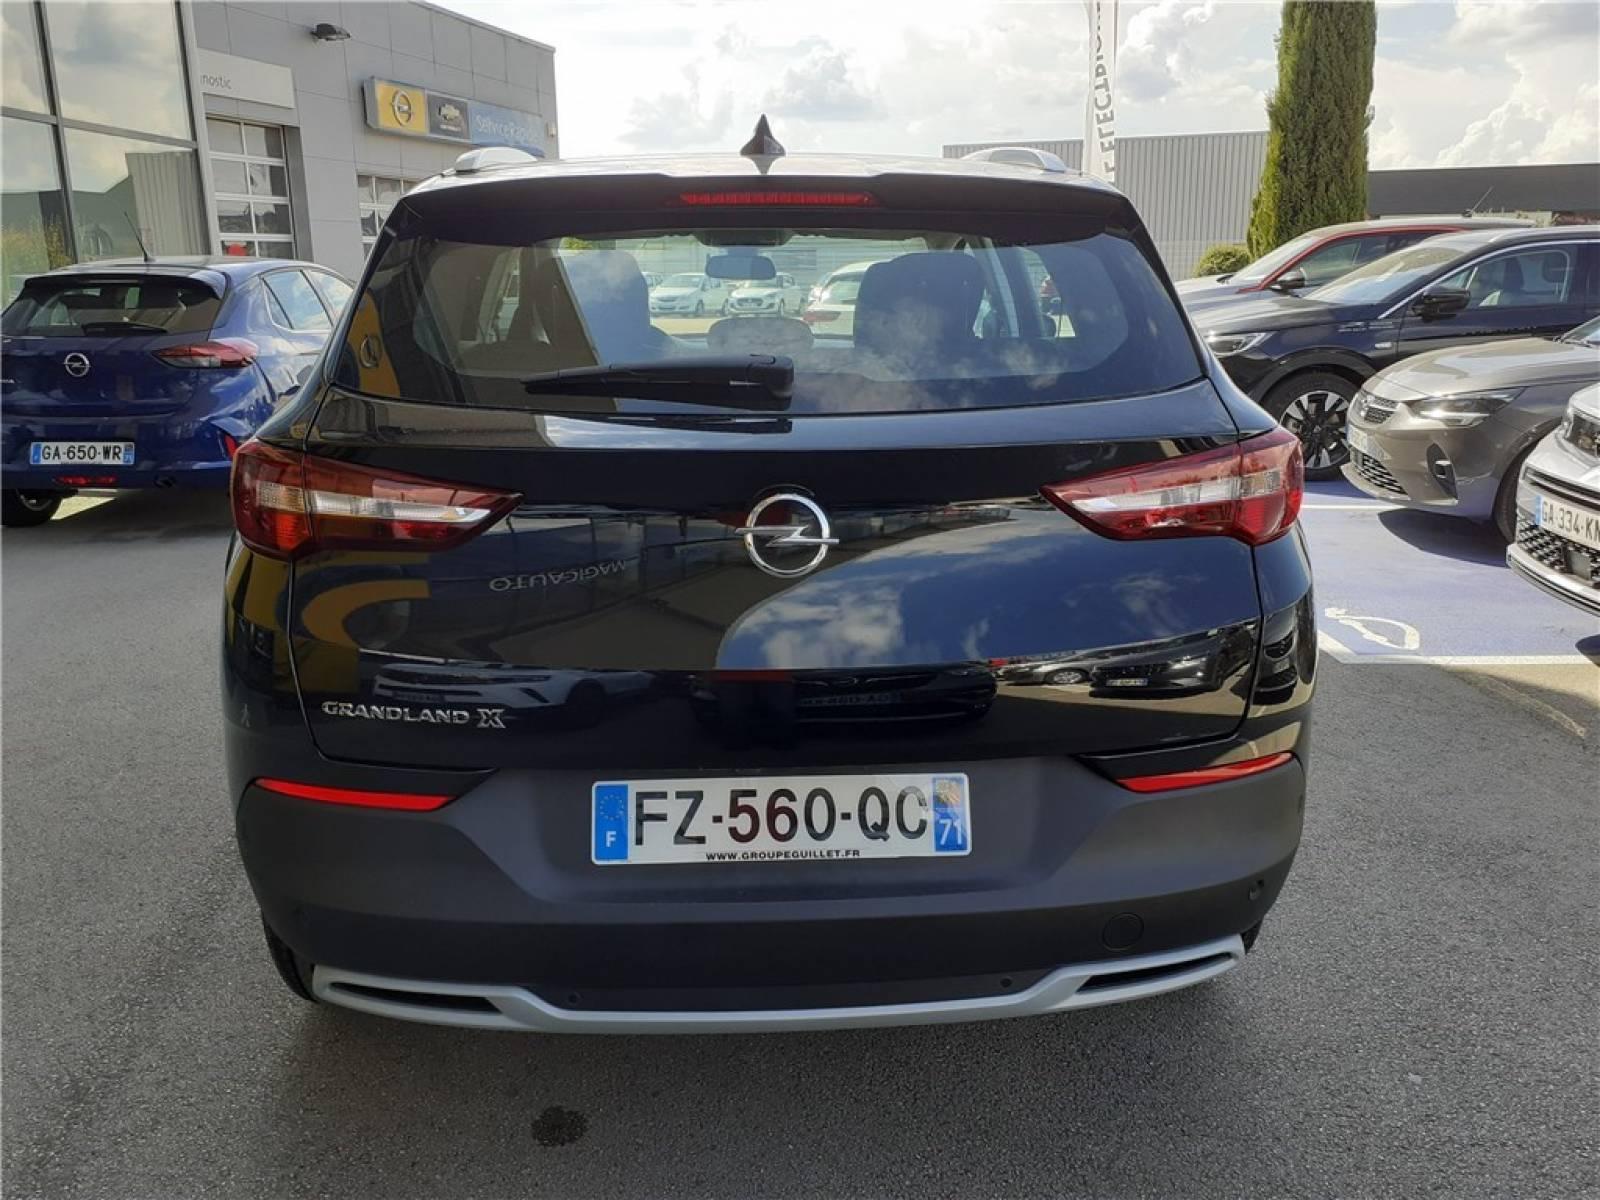 OPEL Grandland X 1.5 Diesel 130 ch BVA8 - véhicule d'occasion - Groupe Guillet - Opel Magicauto - Chalon-sur-Saône - 71380 - Saint-Marcel - 9